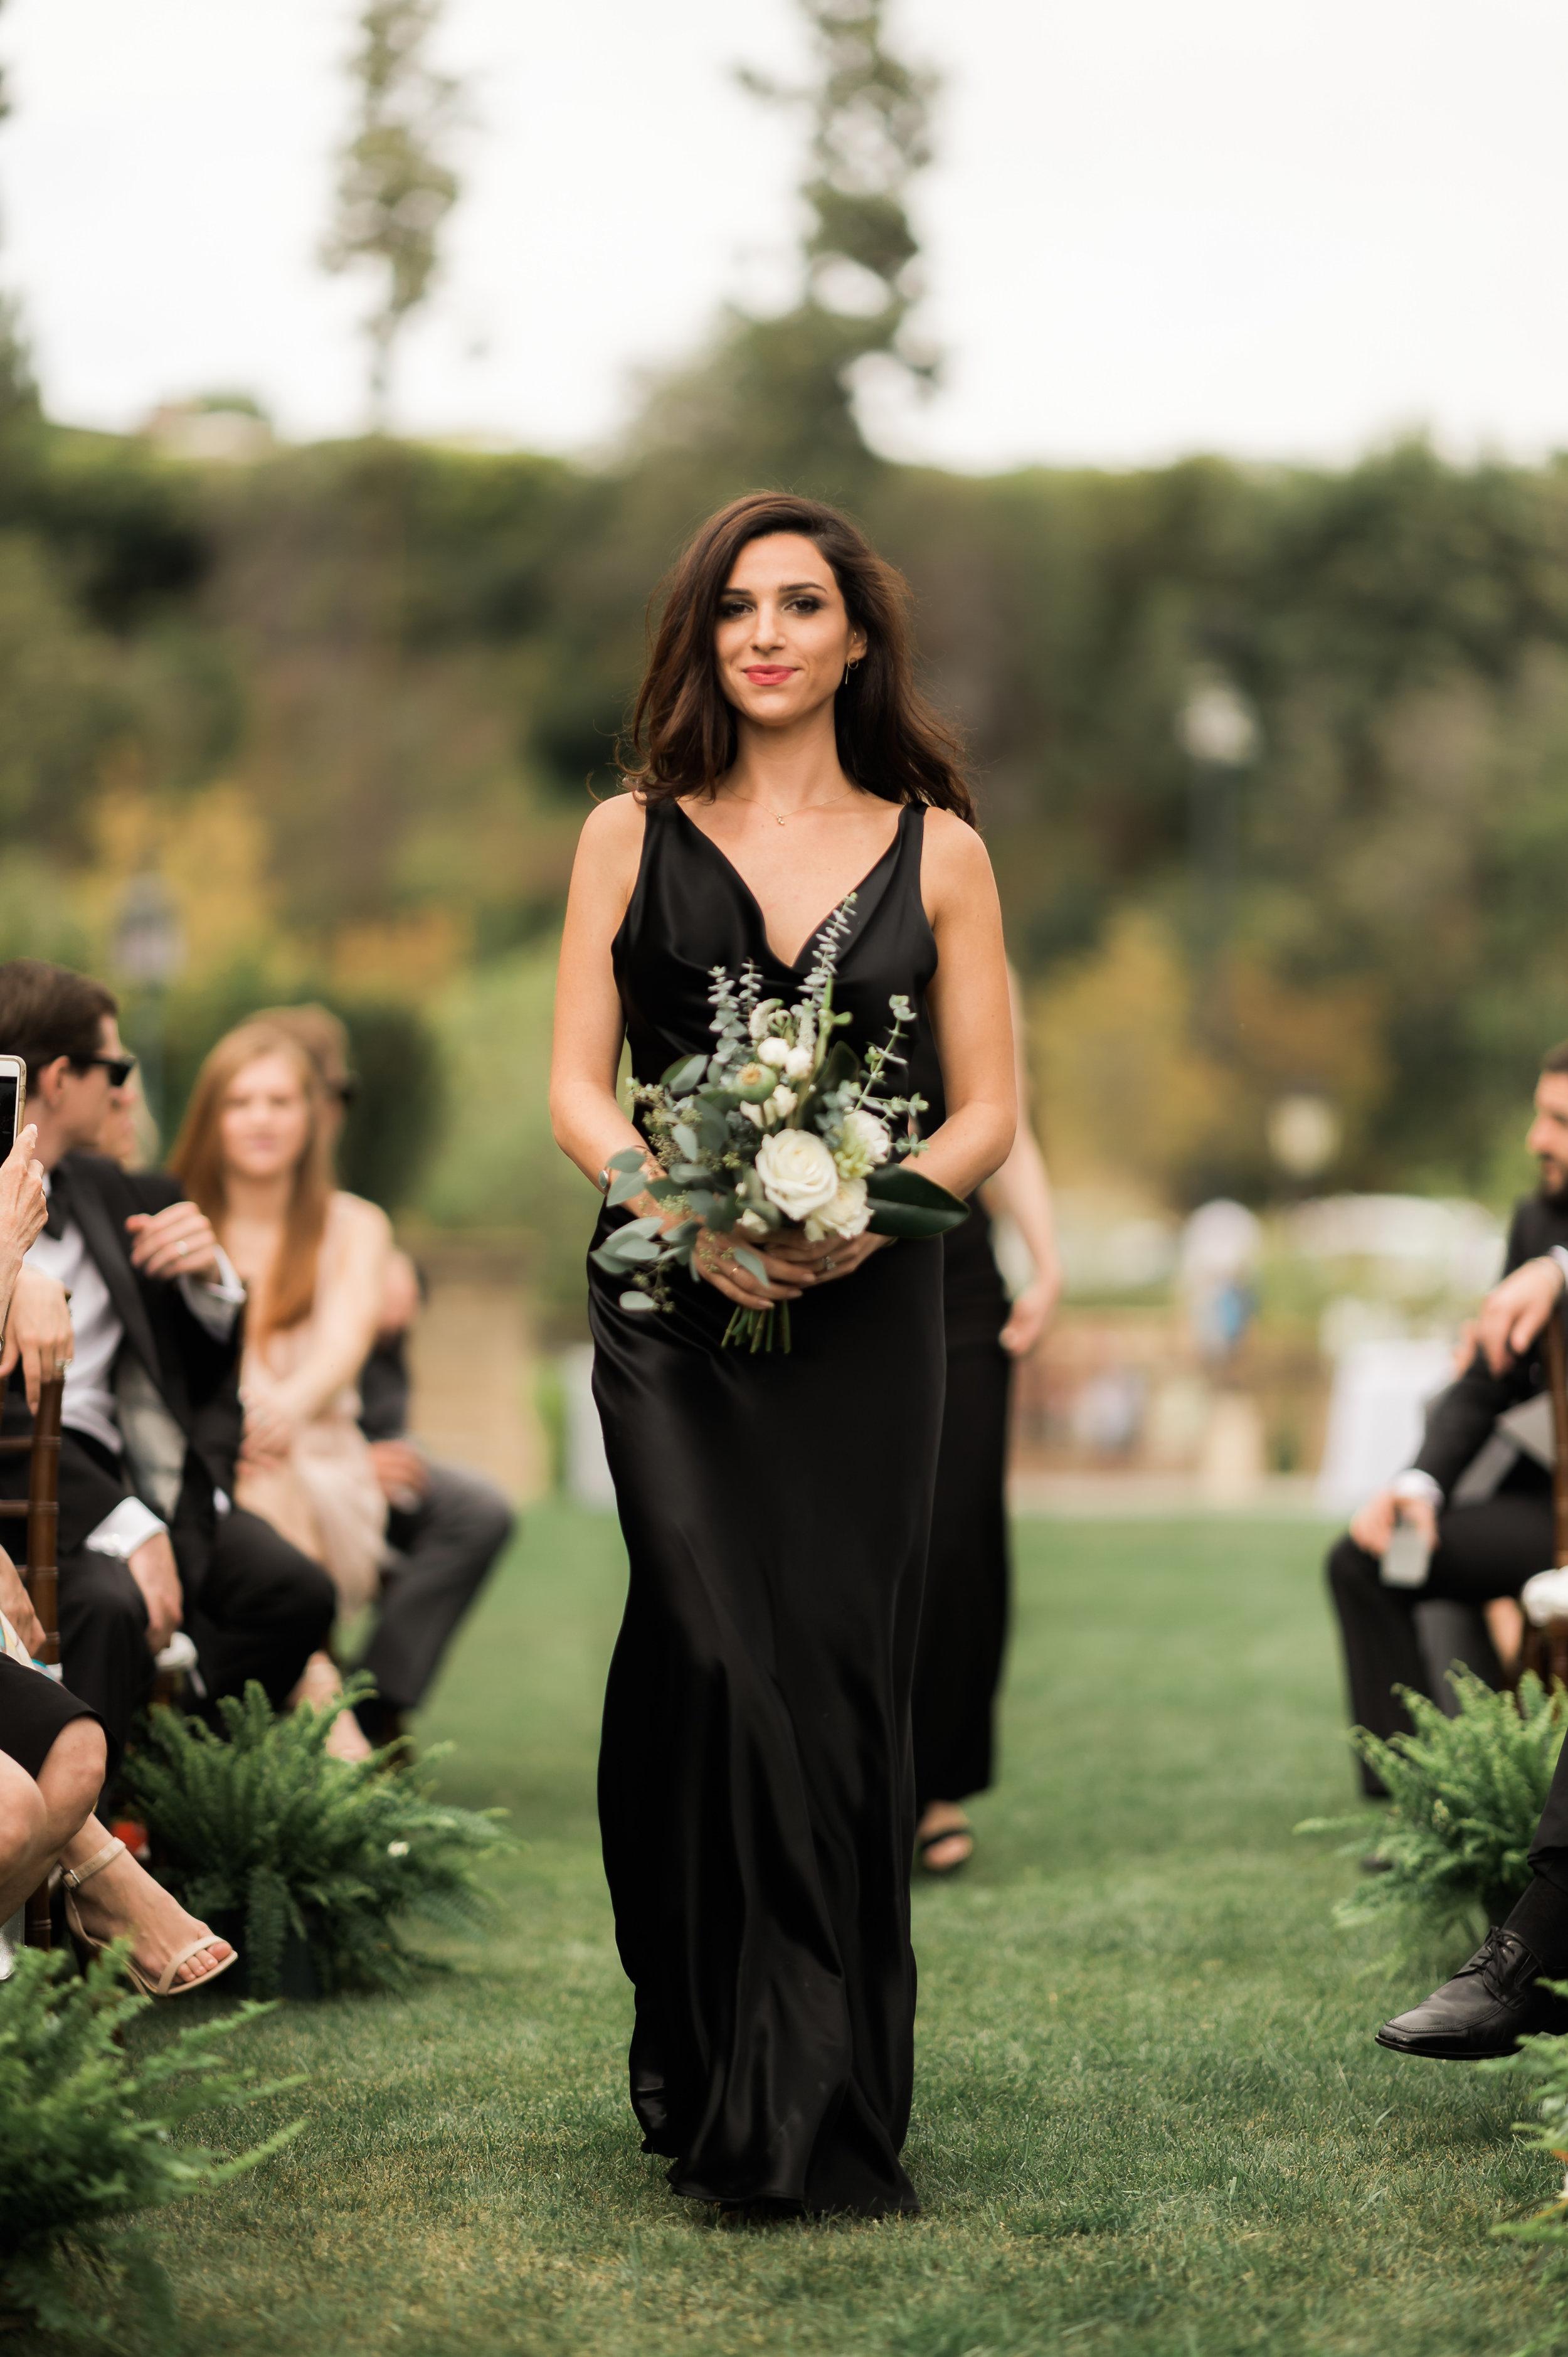 Clean_Modern_Wedding_Florals_Sibyl_Sophia_Bridesmaid.JPG